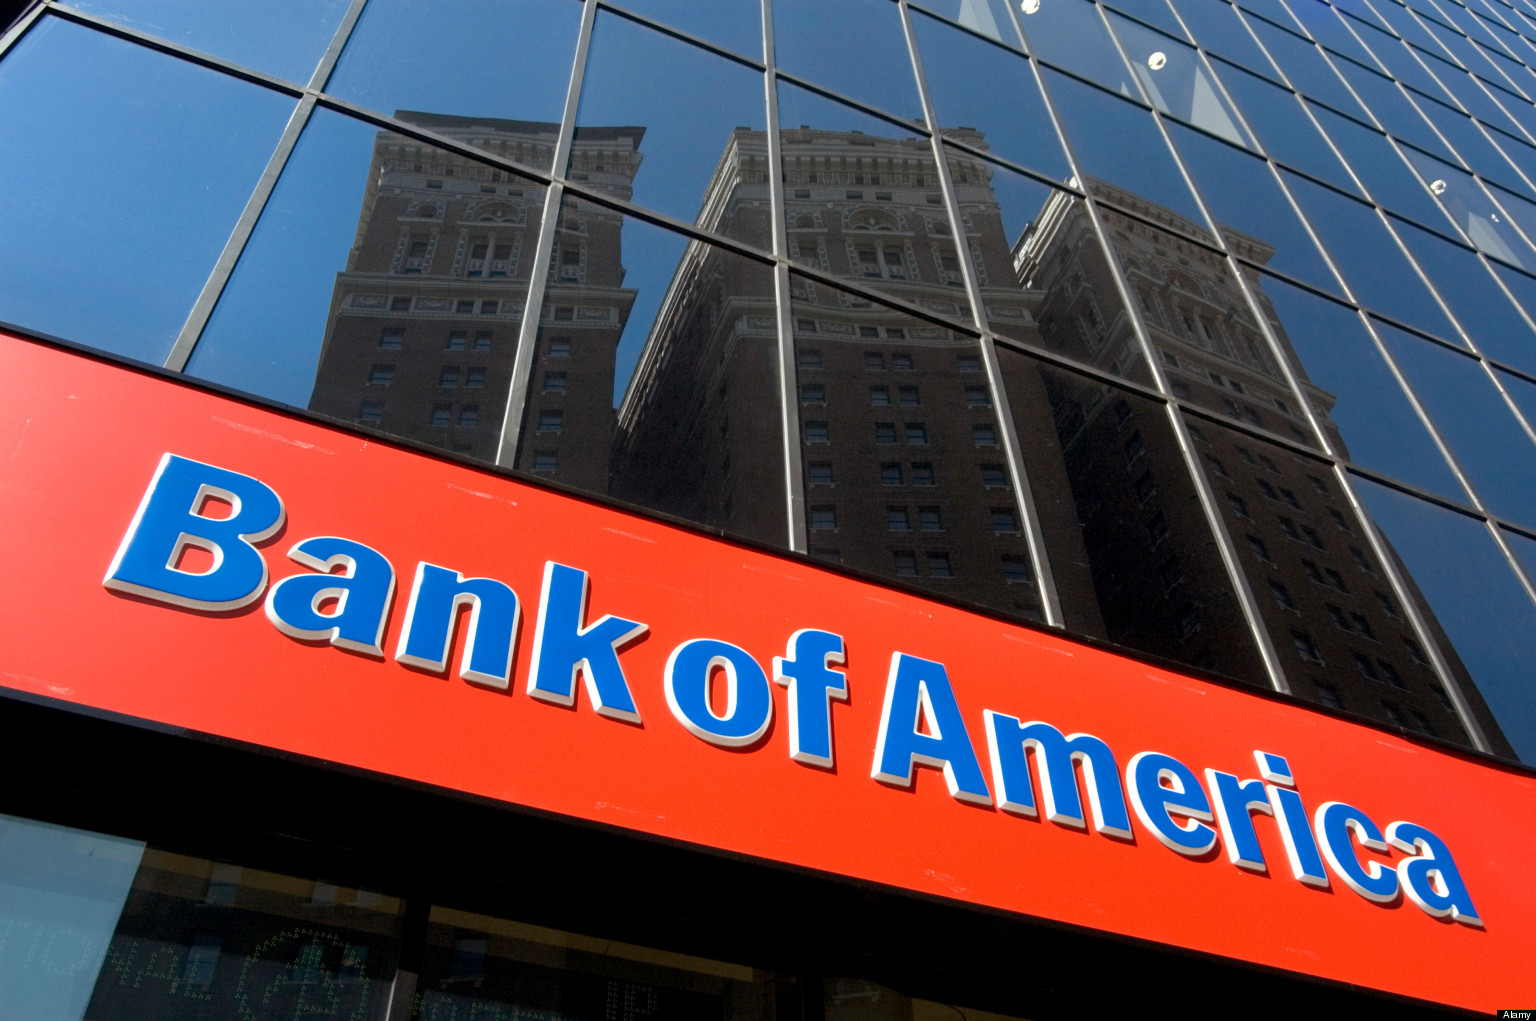 BANK OF AMERICA SIGN ON BRANCH - MIDTOWN MANHATTAN NEW YORK CITY USA